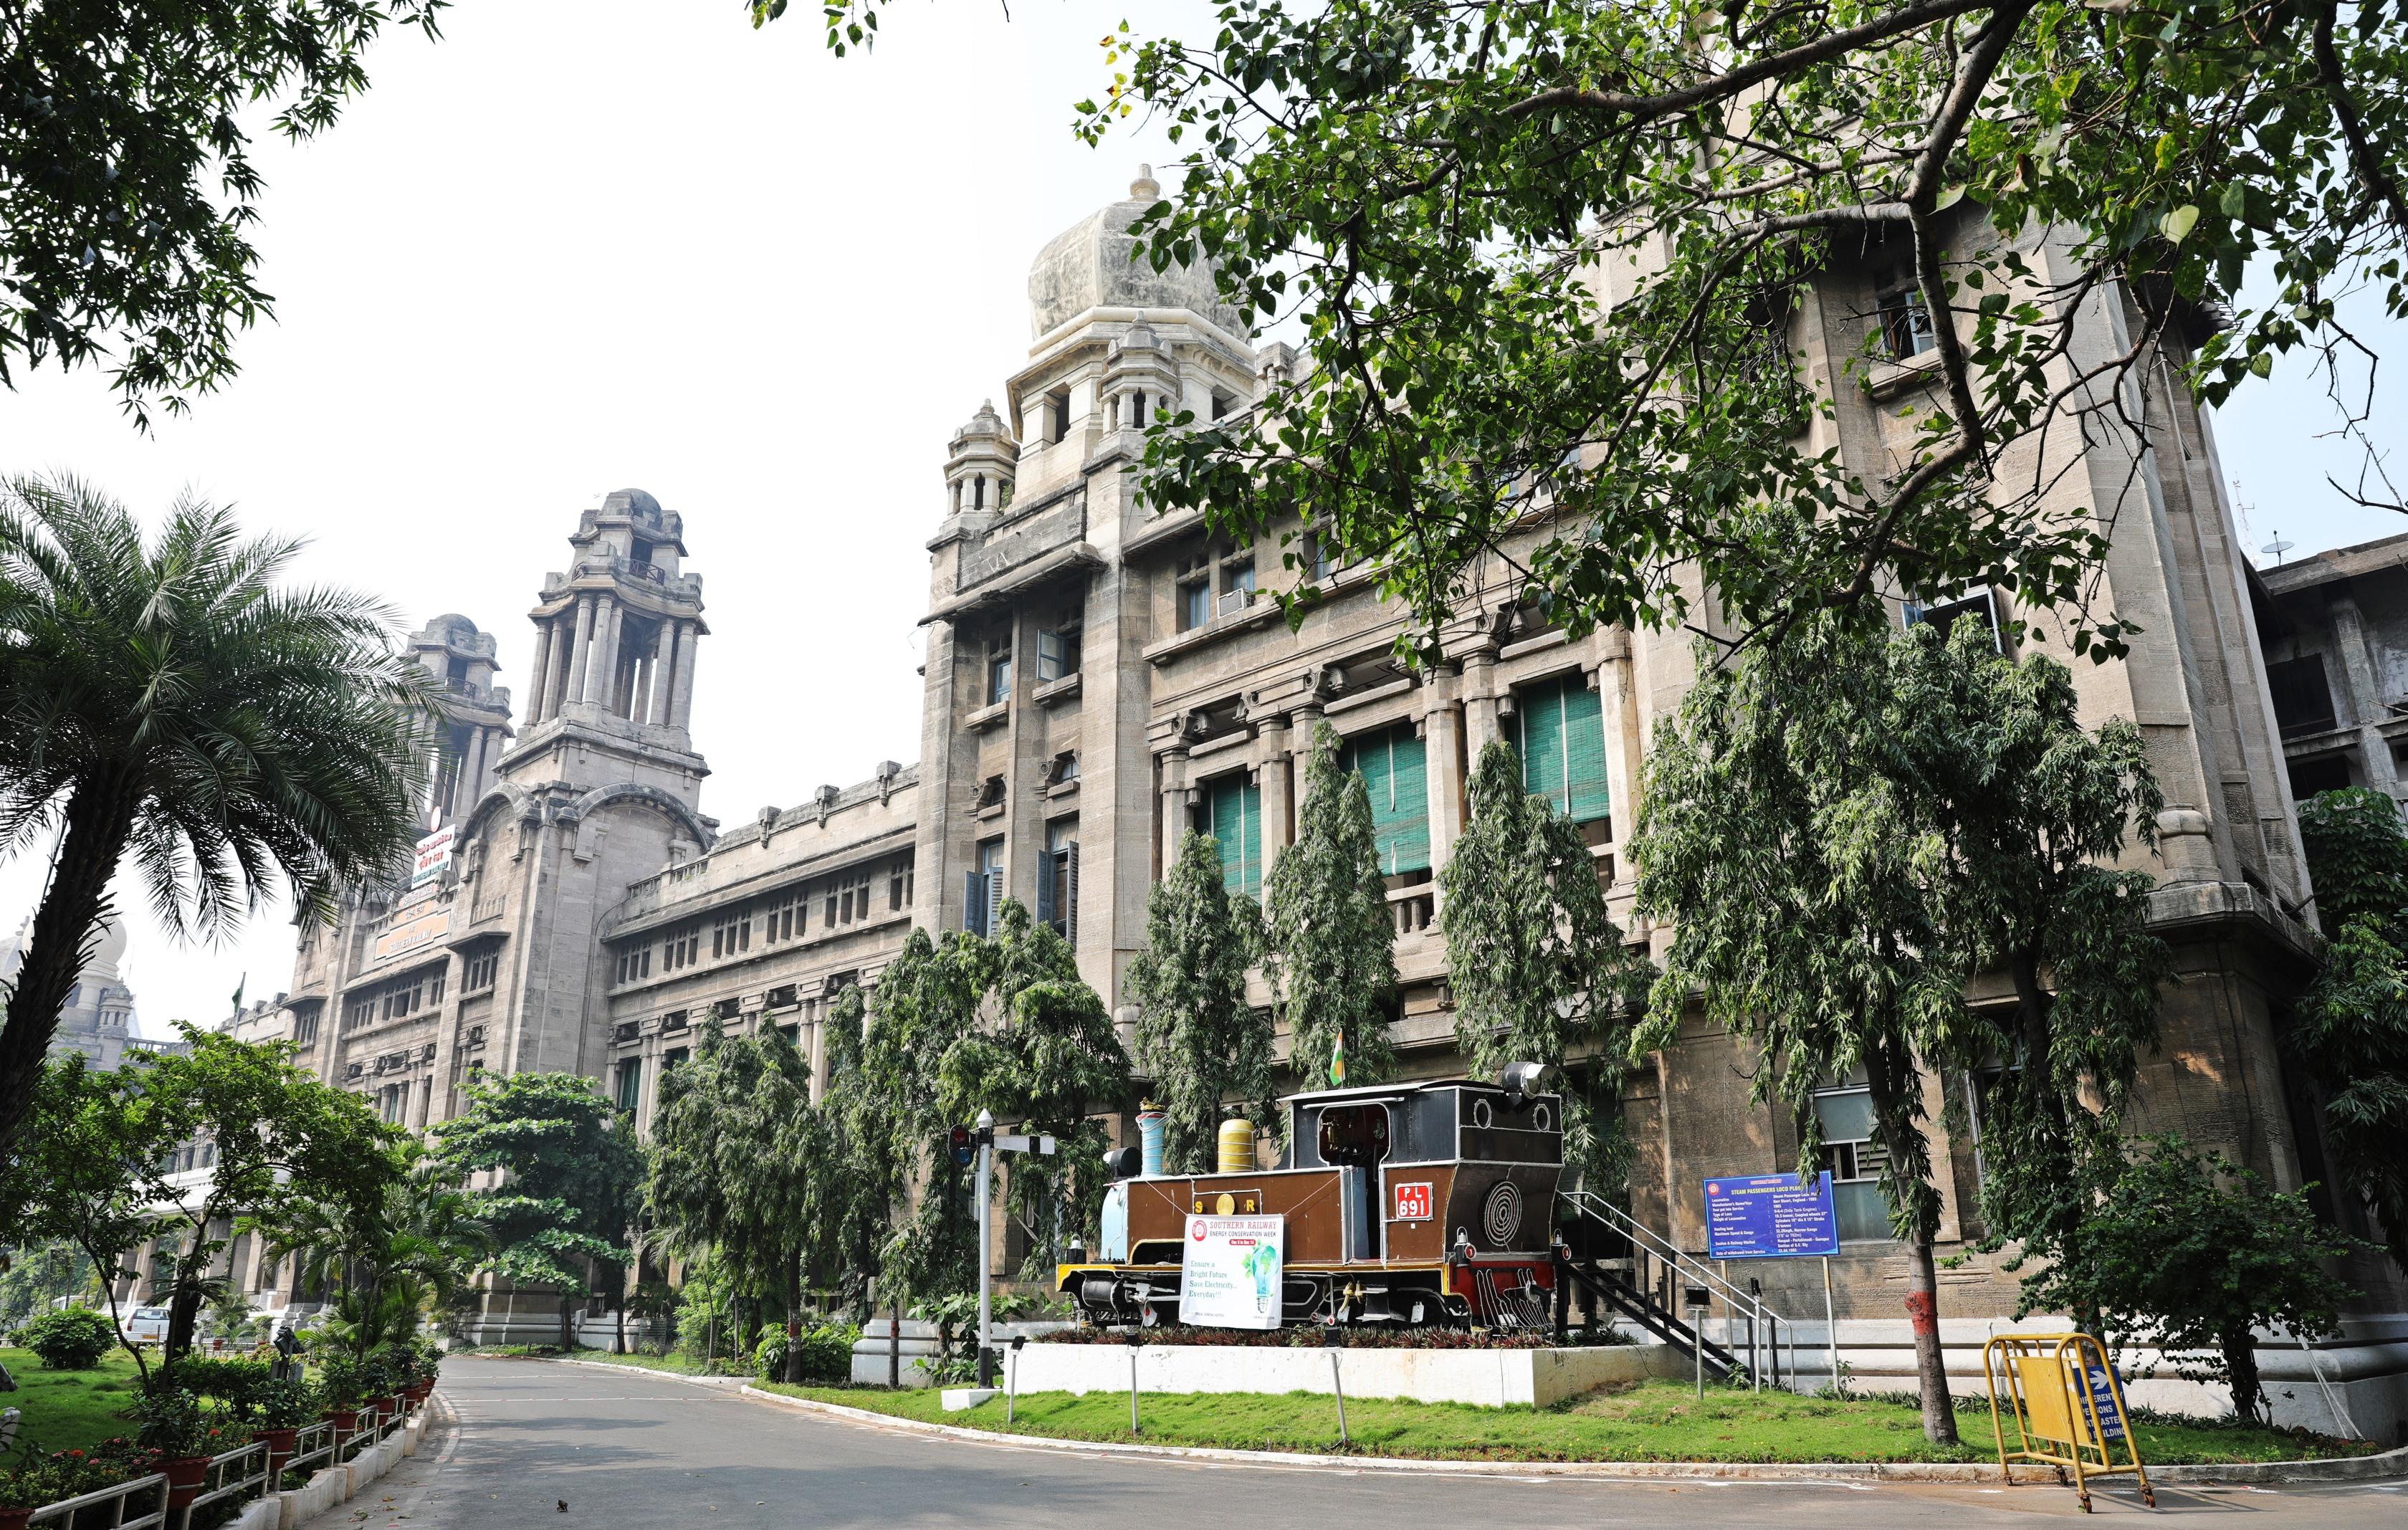 Southern Indian Railway Office, Chennai